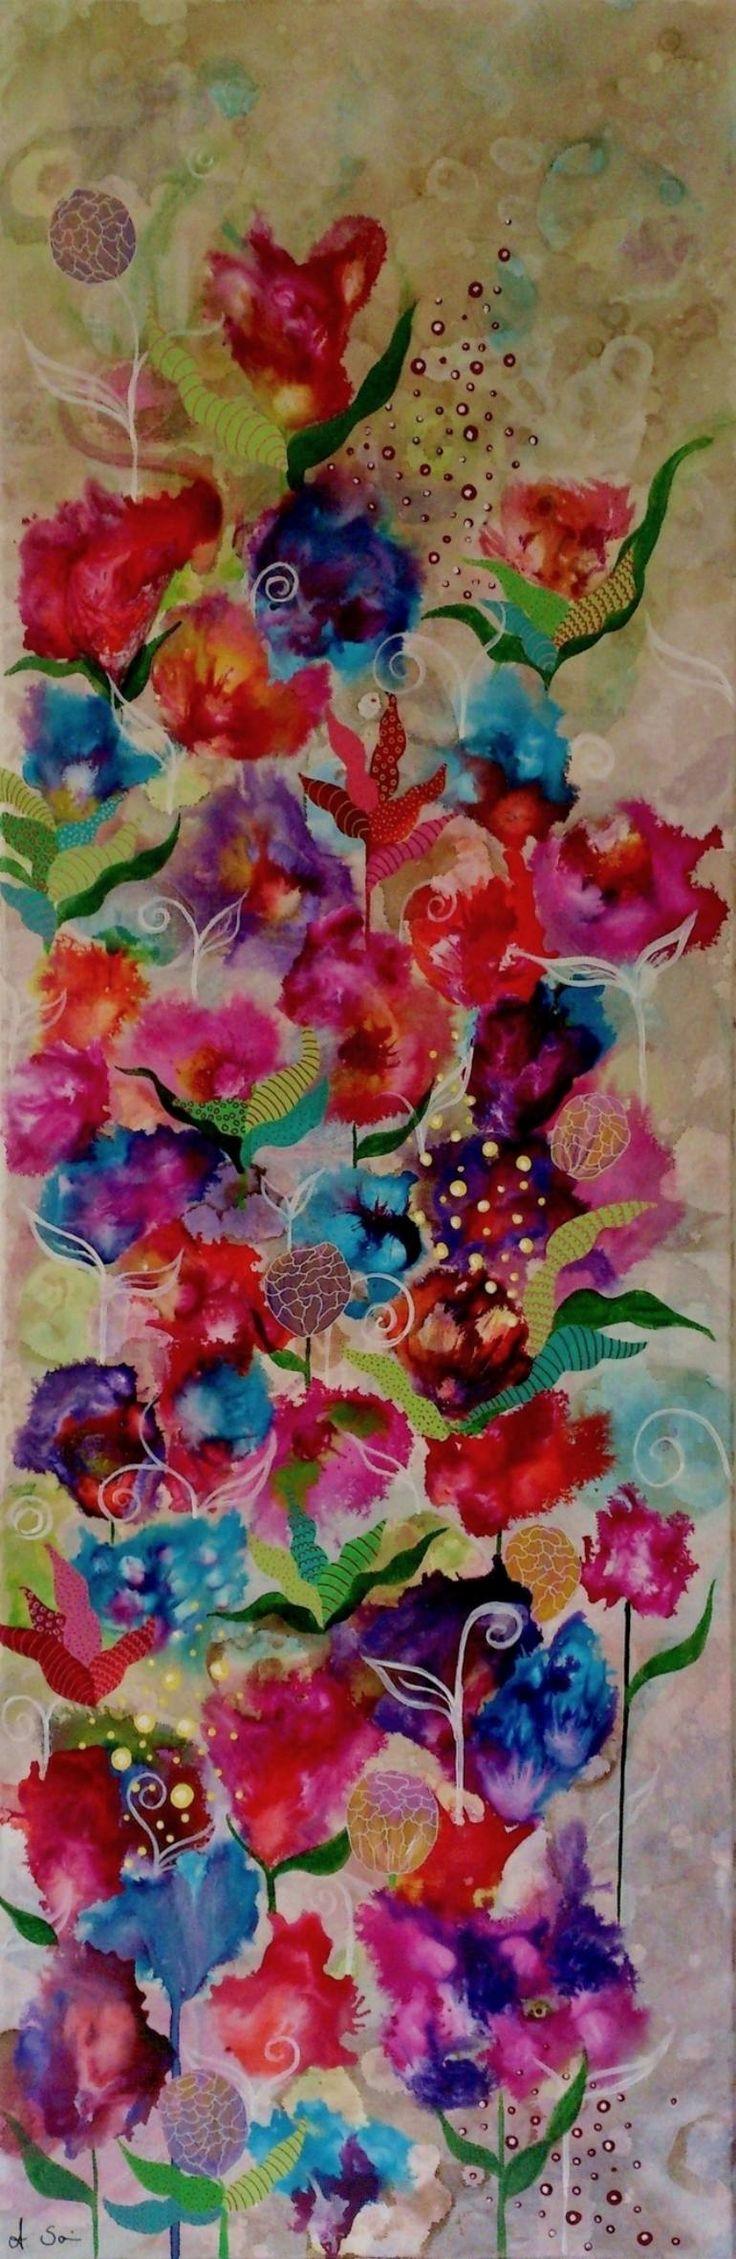 "Saatchi Art Artist Anja Saier; Painting, ""Floral mess"" #art"